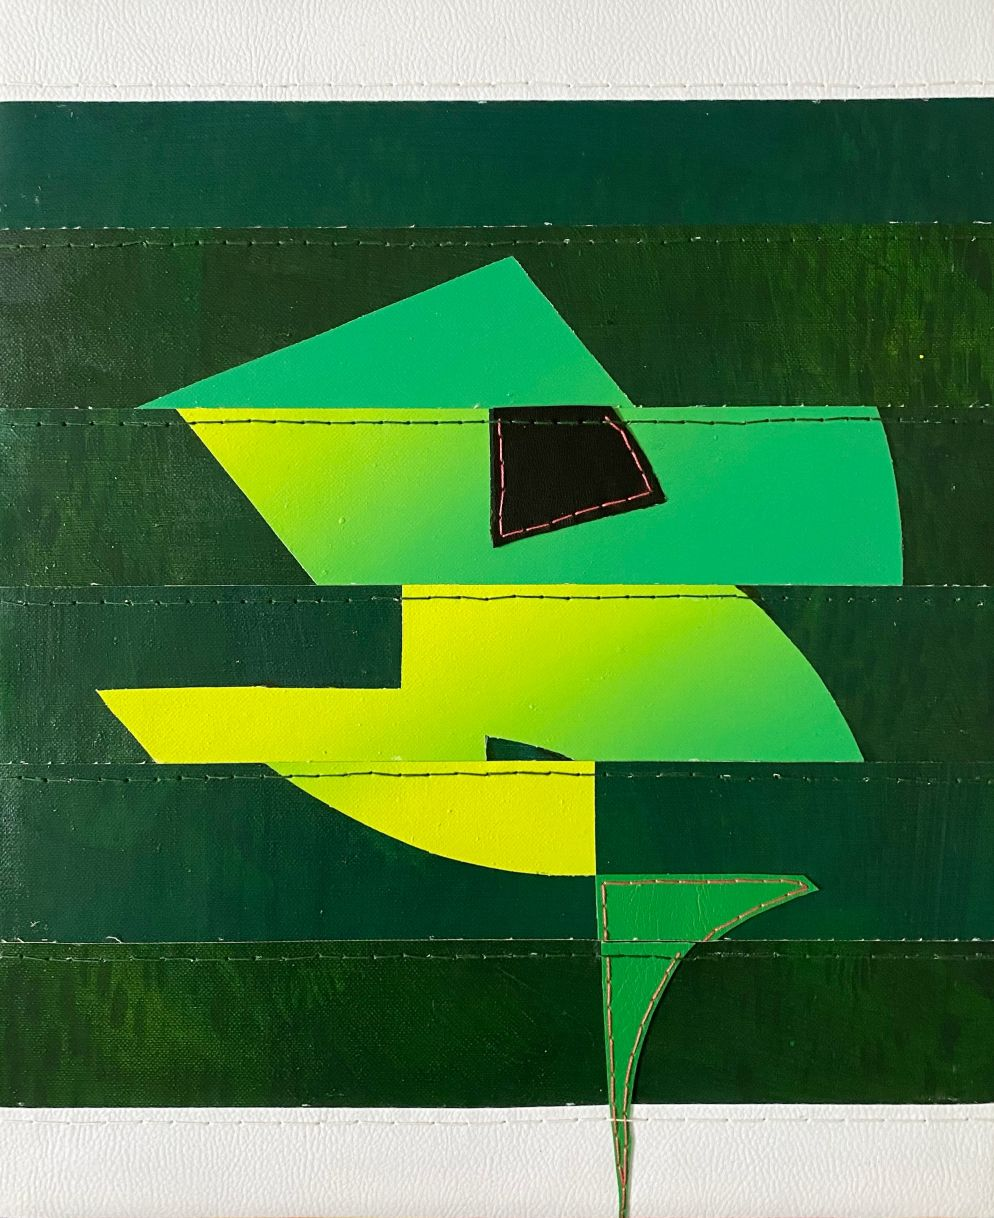 GREEN TOTEM (2020) - Mónica Jover Calvo